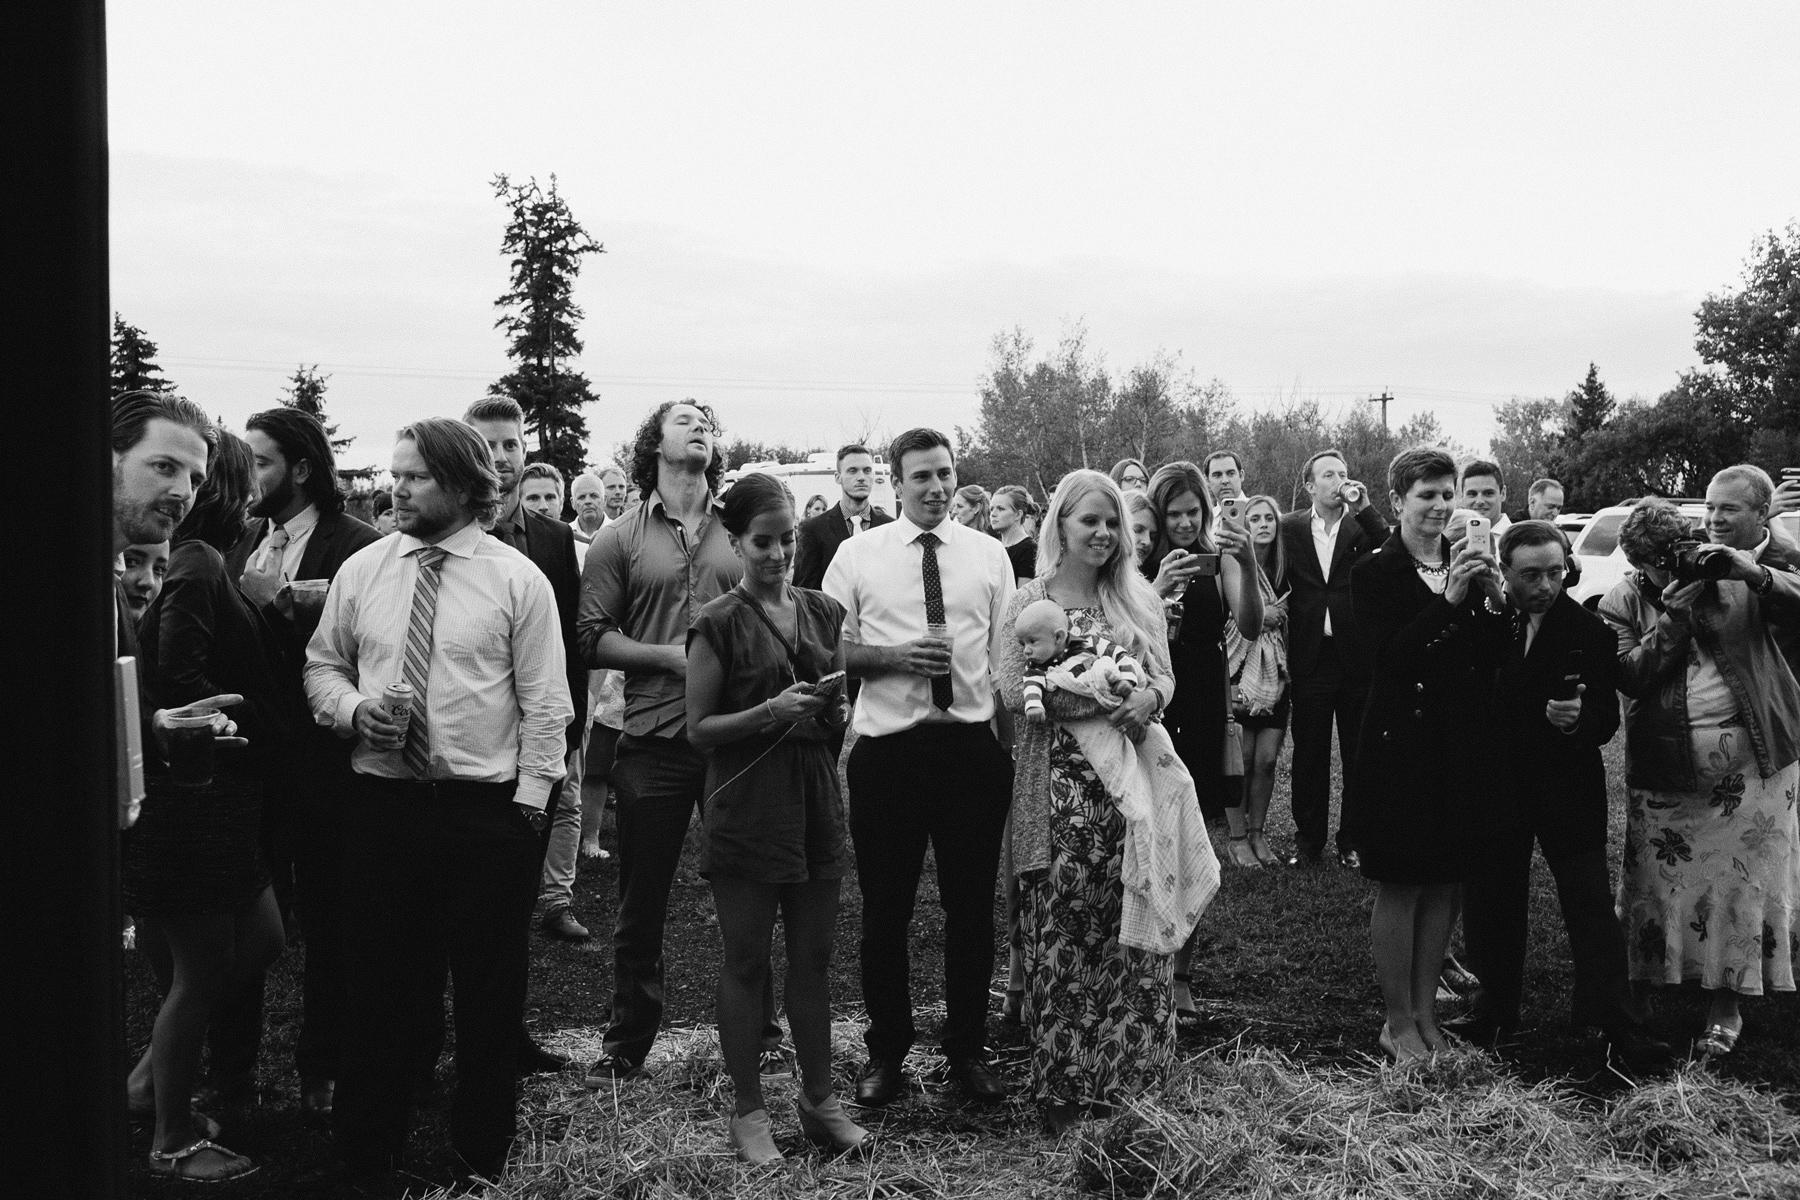 alberta-farm-wedding-photographer-rp-wj-238.jpg